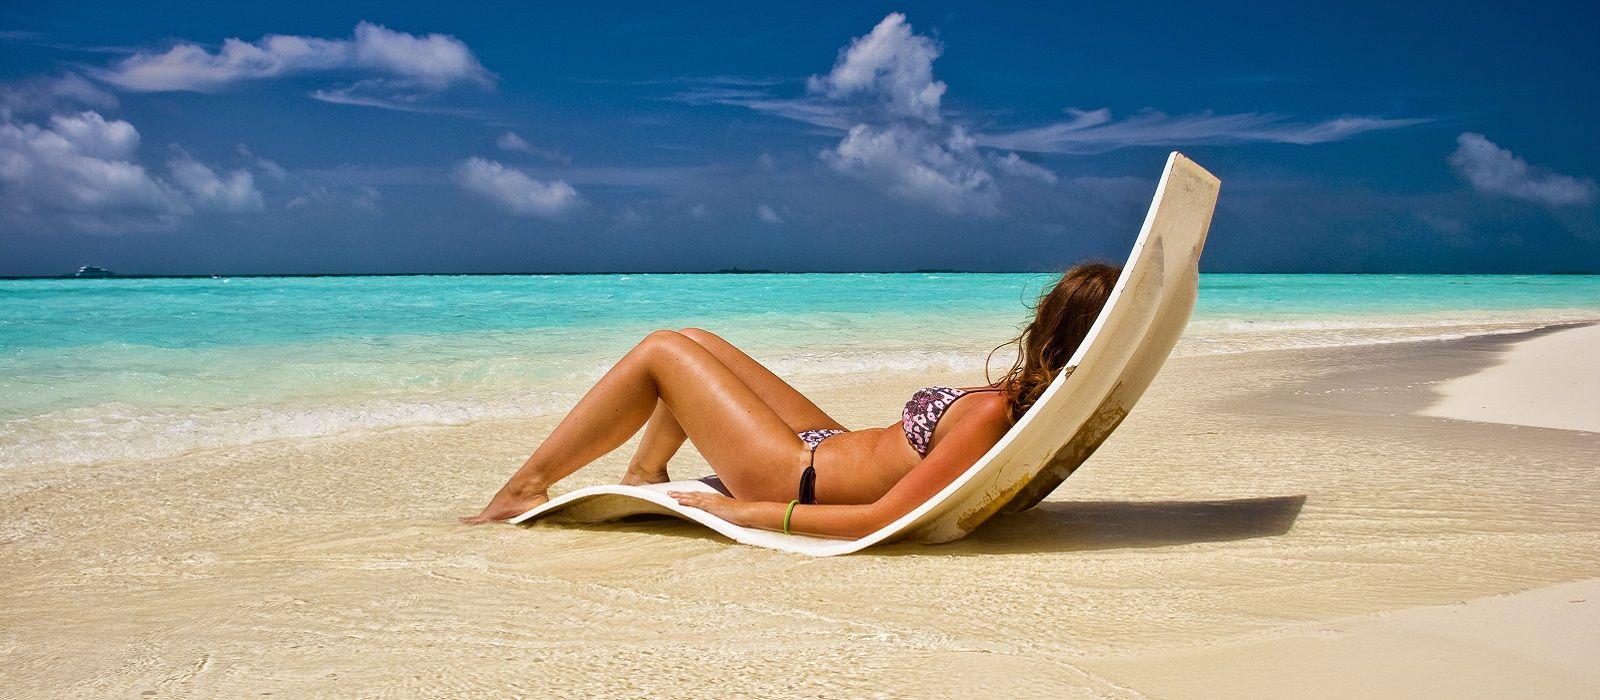 Peru: Luxury Honeymoon and Beach Tour Trip 9